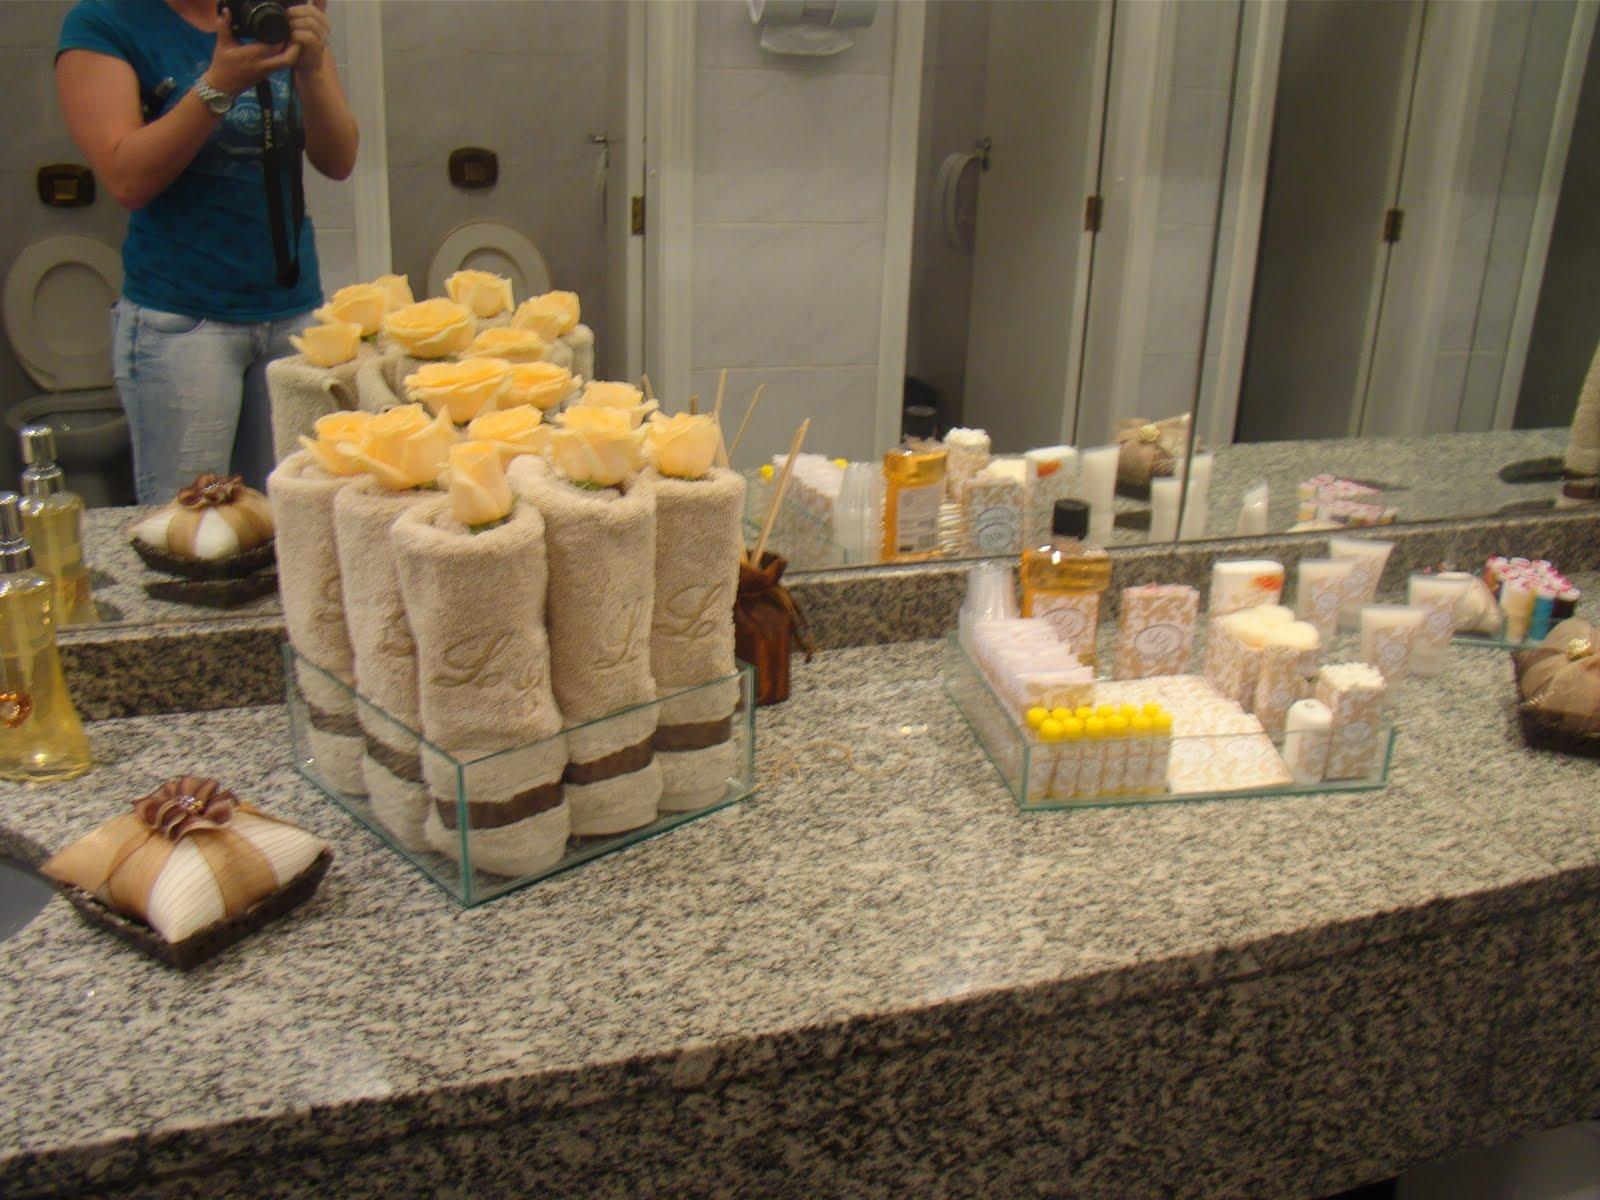 Bella Aromas Kits personalizados para banheiros de casamento, festas de aniv -> Decoracao De Banheiro Para Casamento